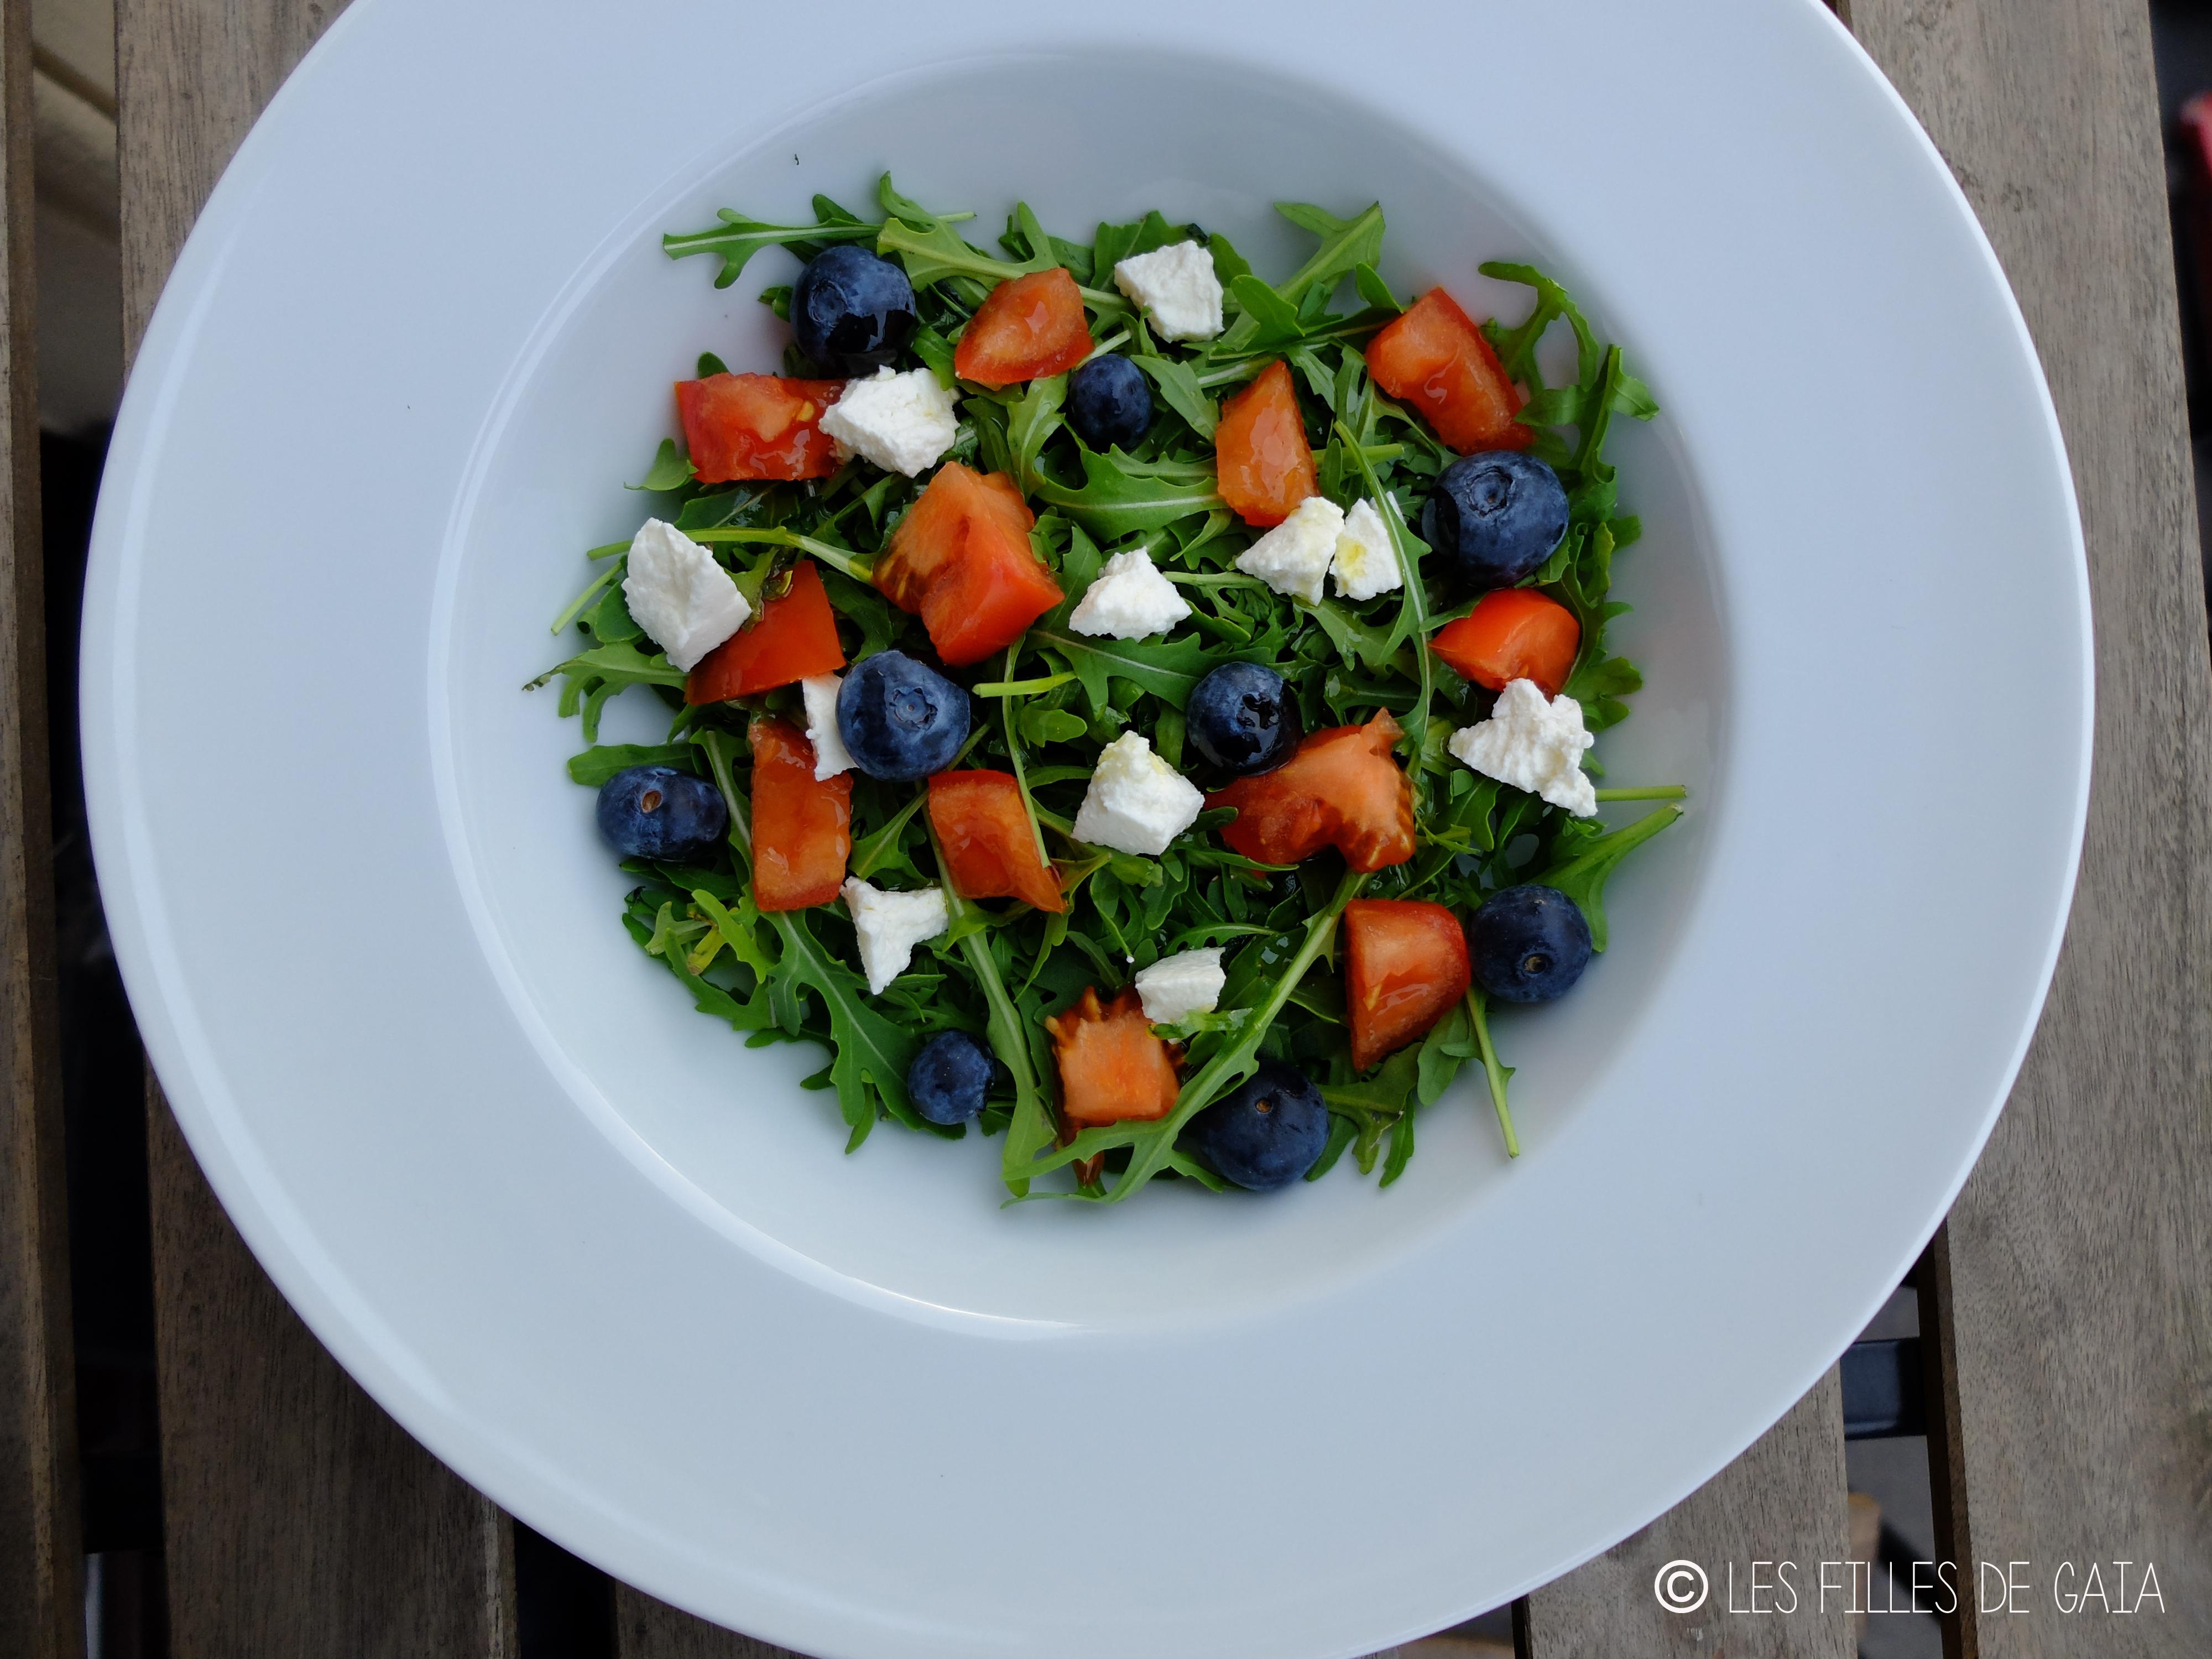 Recette originale de l t la salade tomate feta myrtilles - Salade originale ete ...